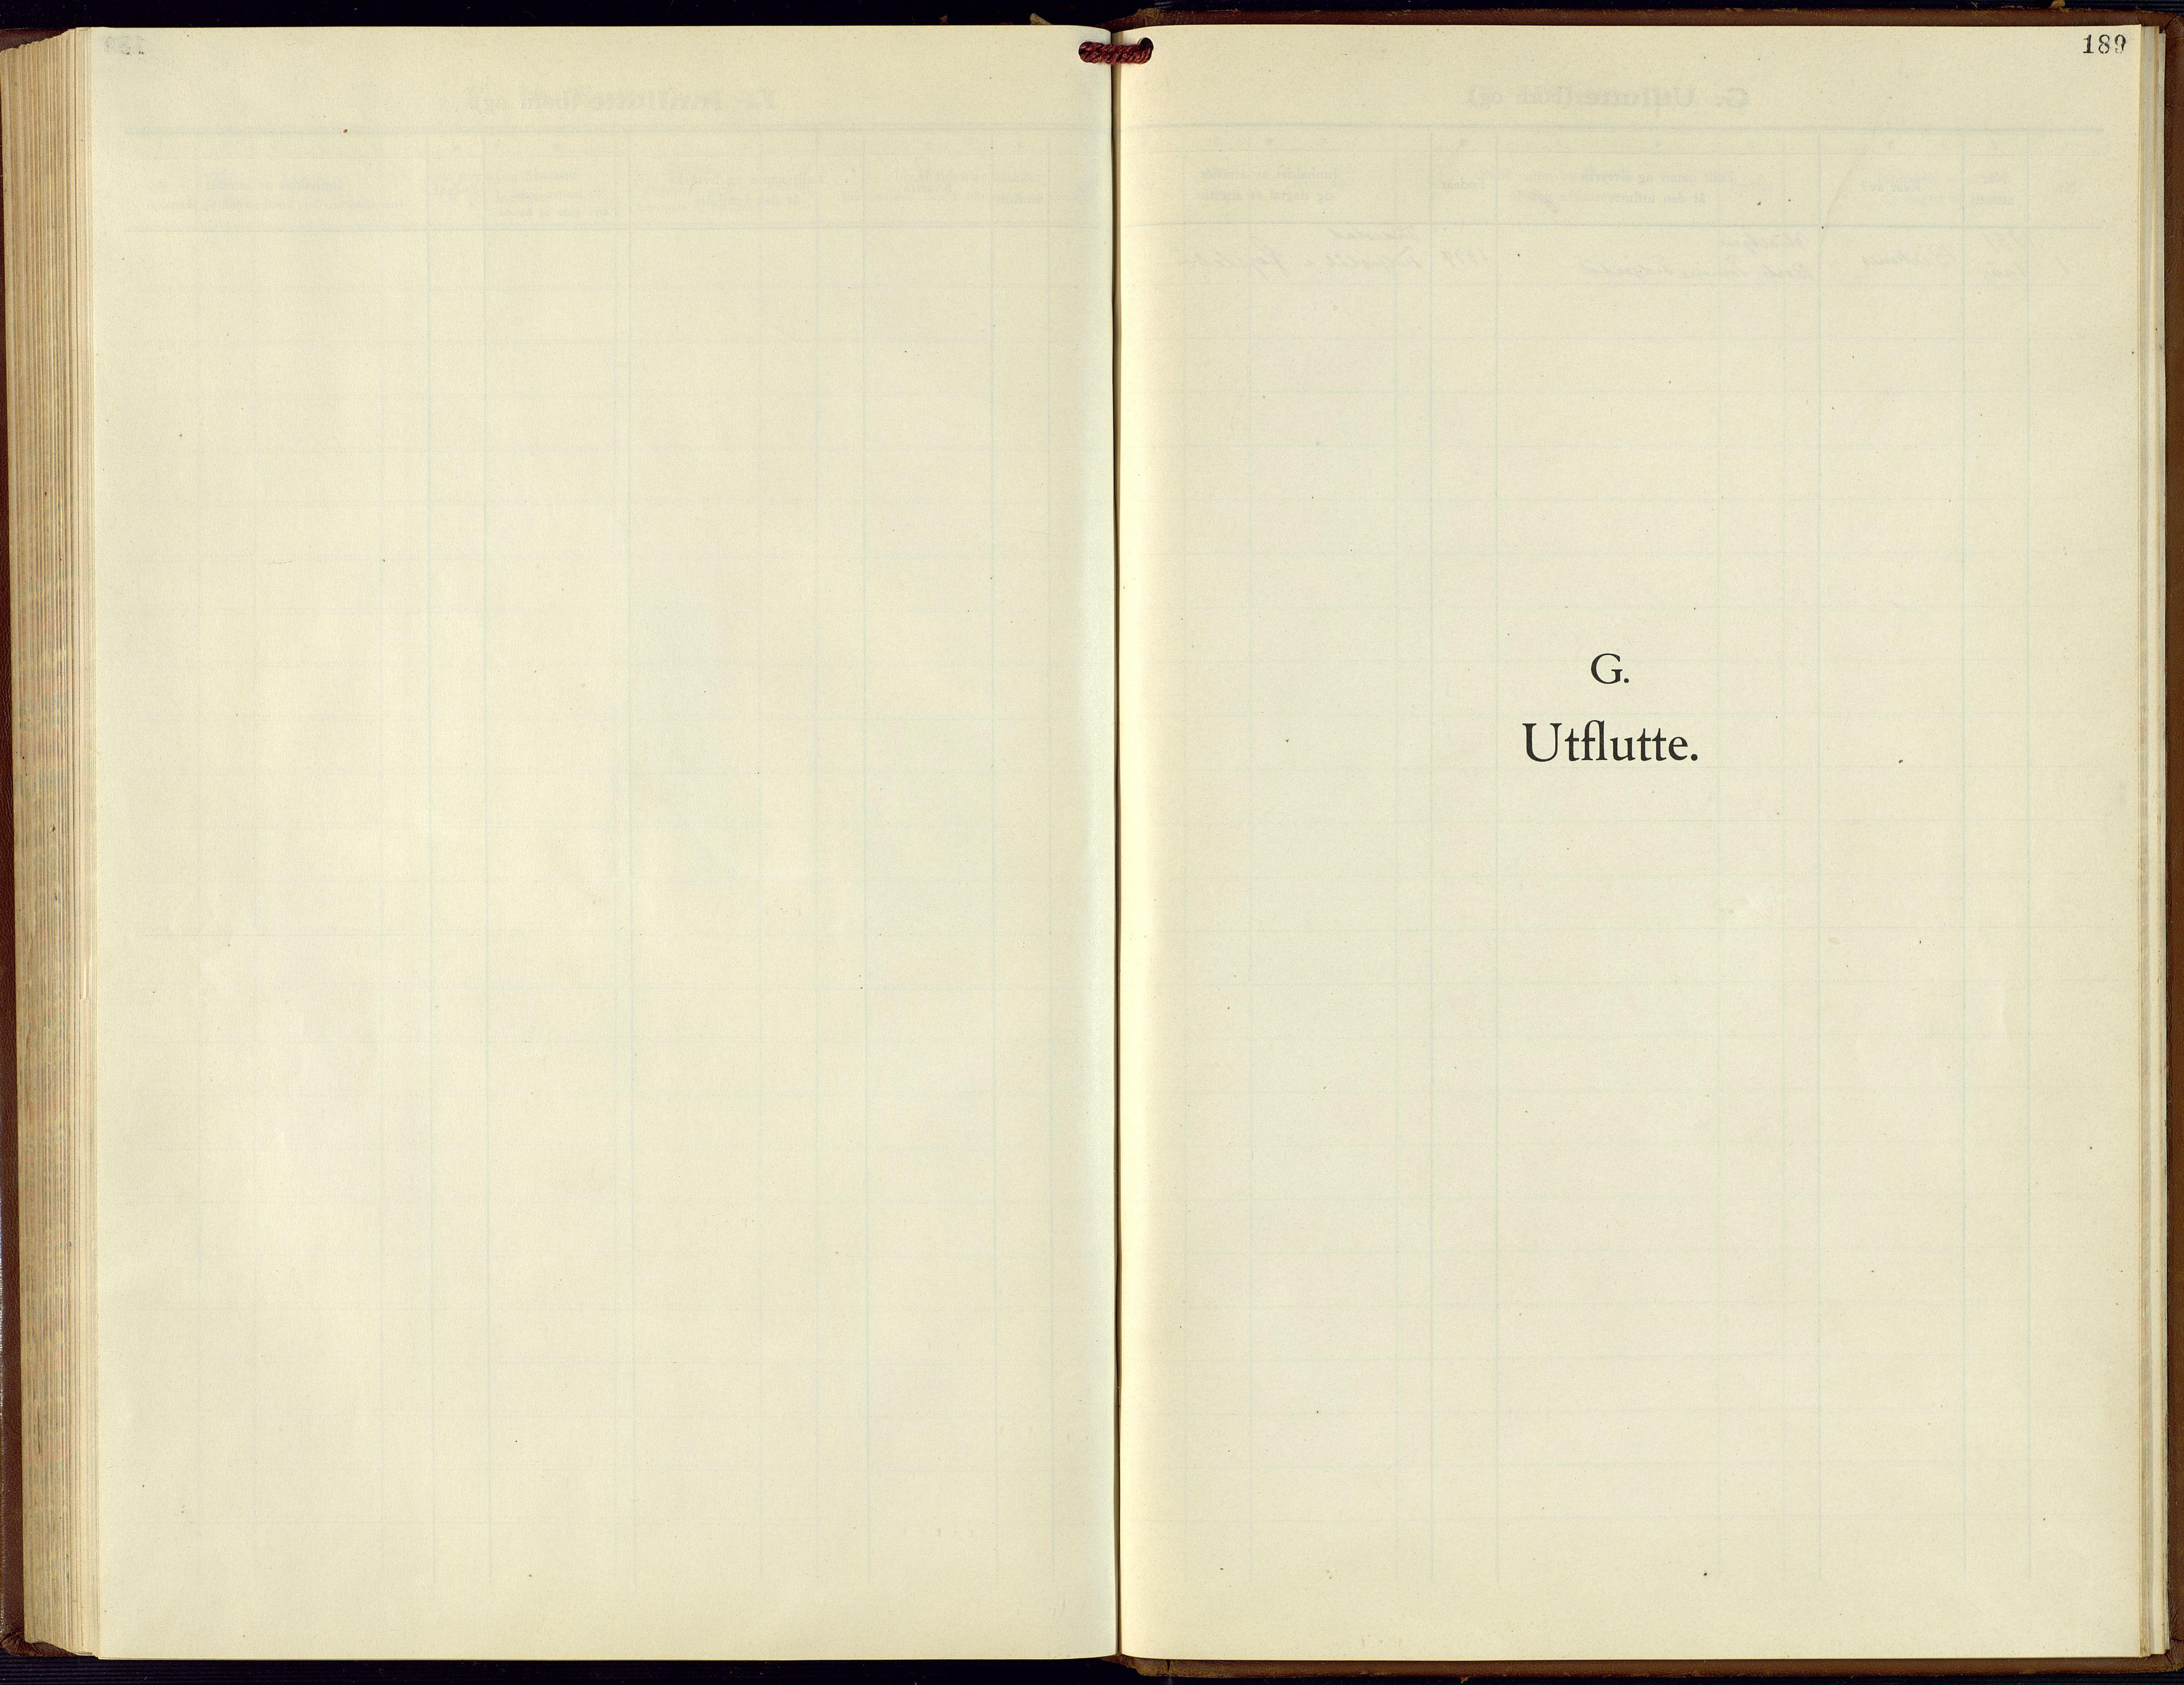 SAK, Hægebostad sokneprestkontor, F/Fb/Fba/L0006: Klokkerbok nr. B 6, 1931-1970, s. 189